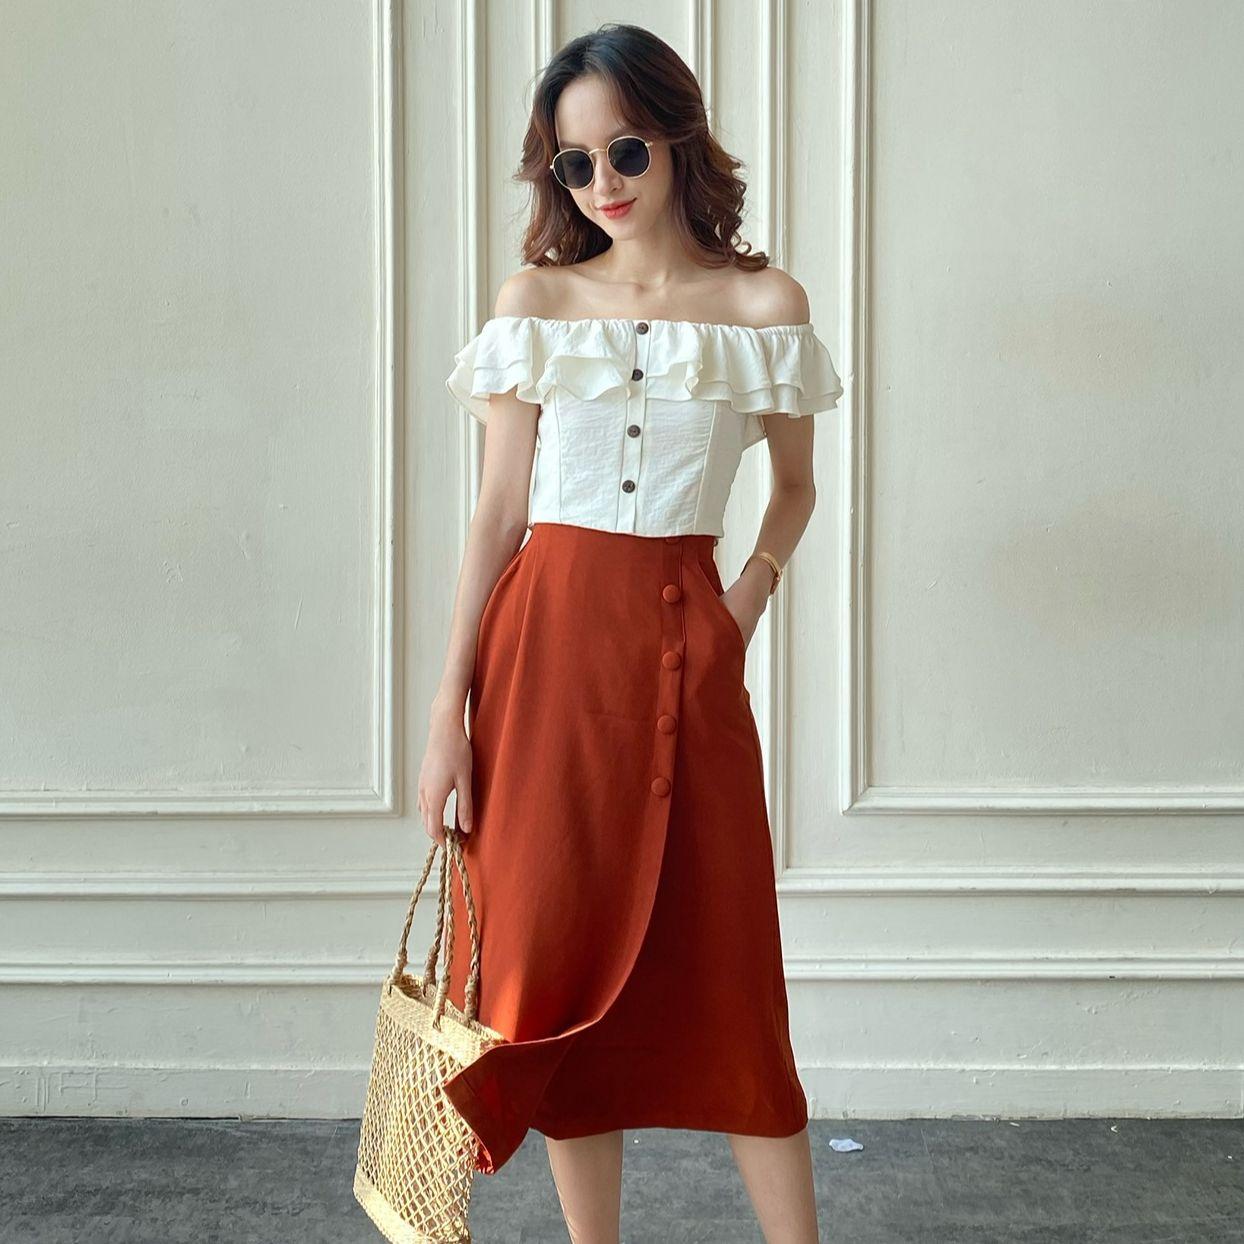 OLV - Chân váy Tangerine Button Midi Skirt